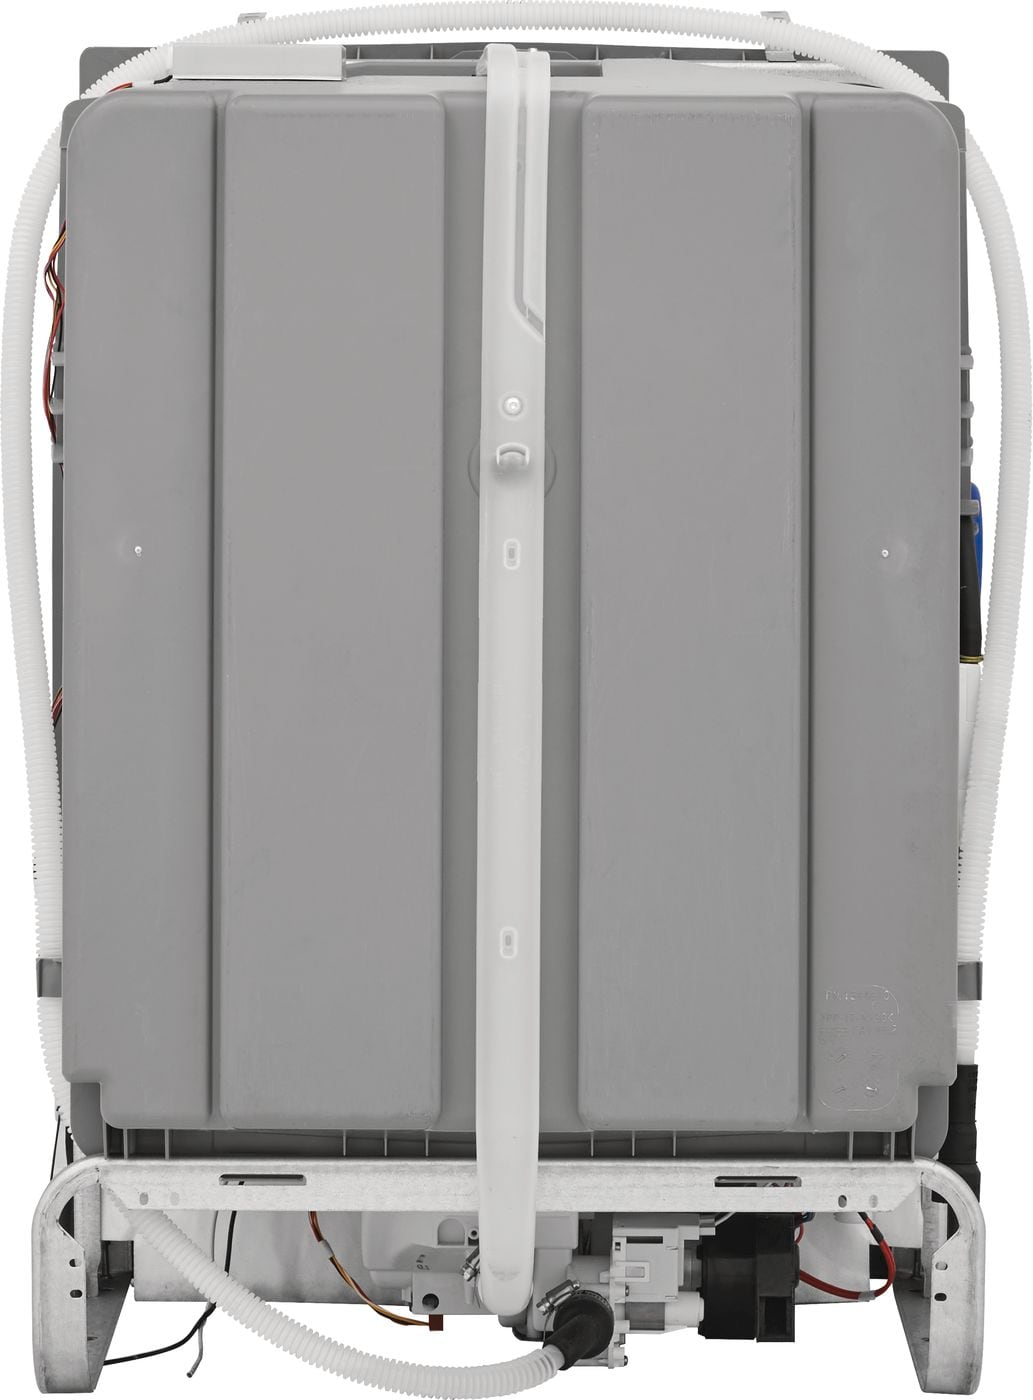 "Model: FGIP2468UF   Frigidaire Gallery 24"" Built-In Dishwasher with Dual OrbitClean® Wash System"